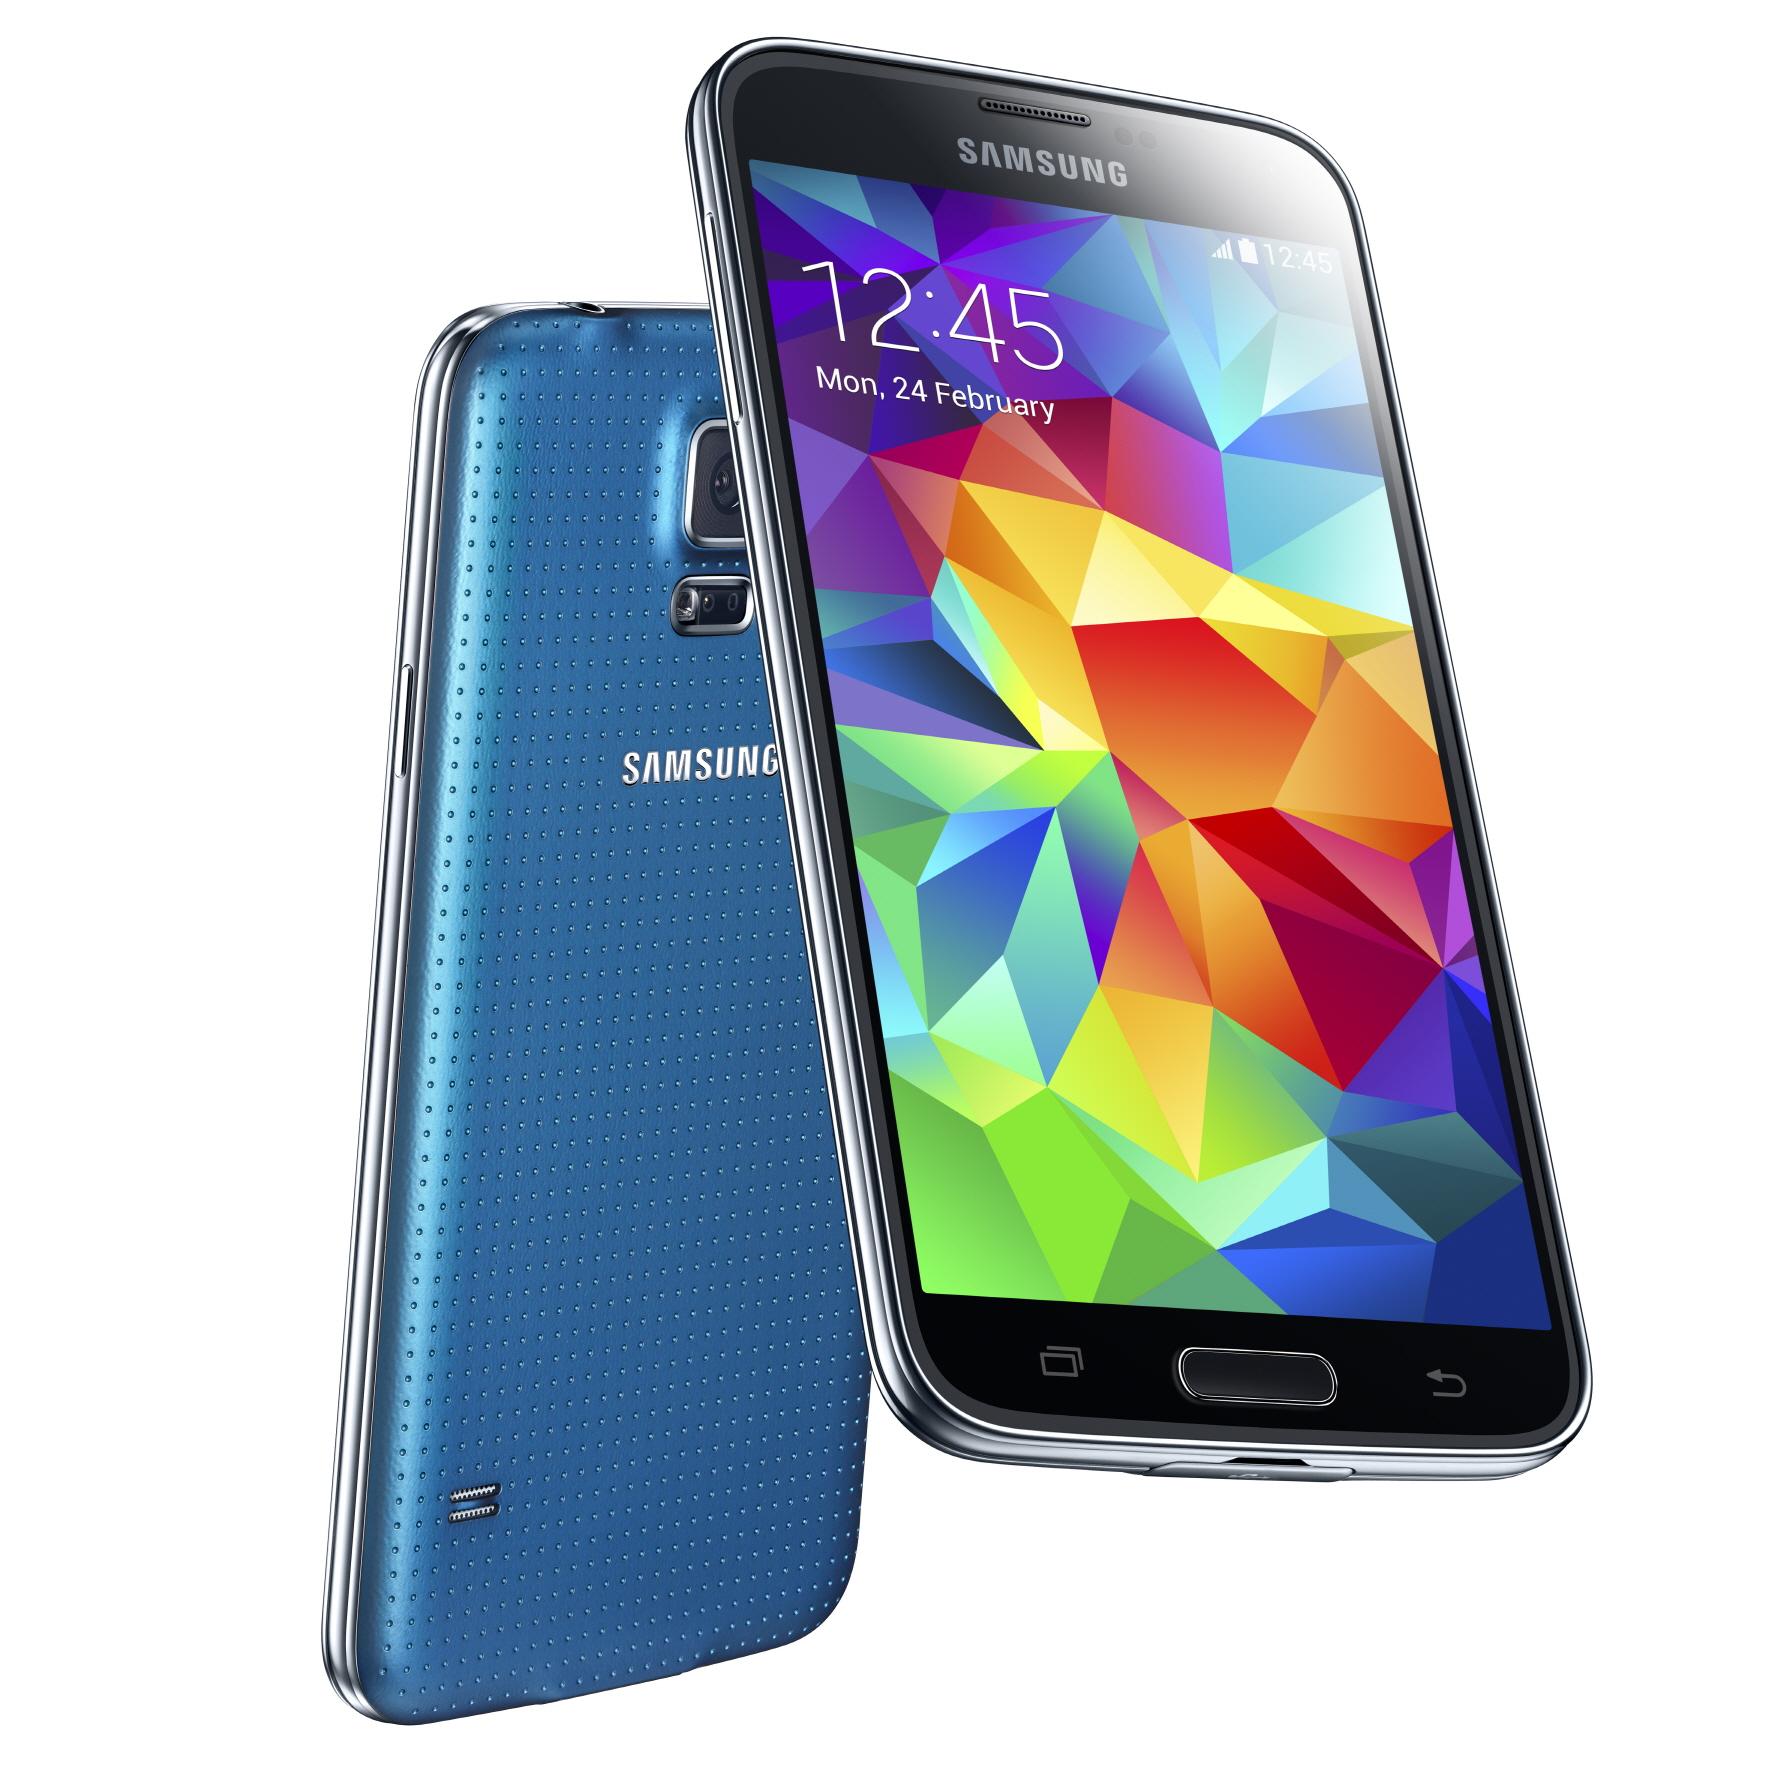 Oplev Samsung Galaxy S5 før alle andre